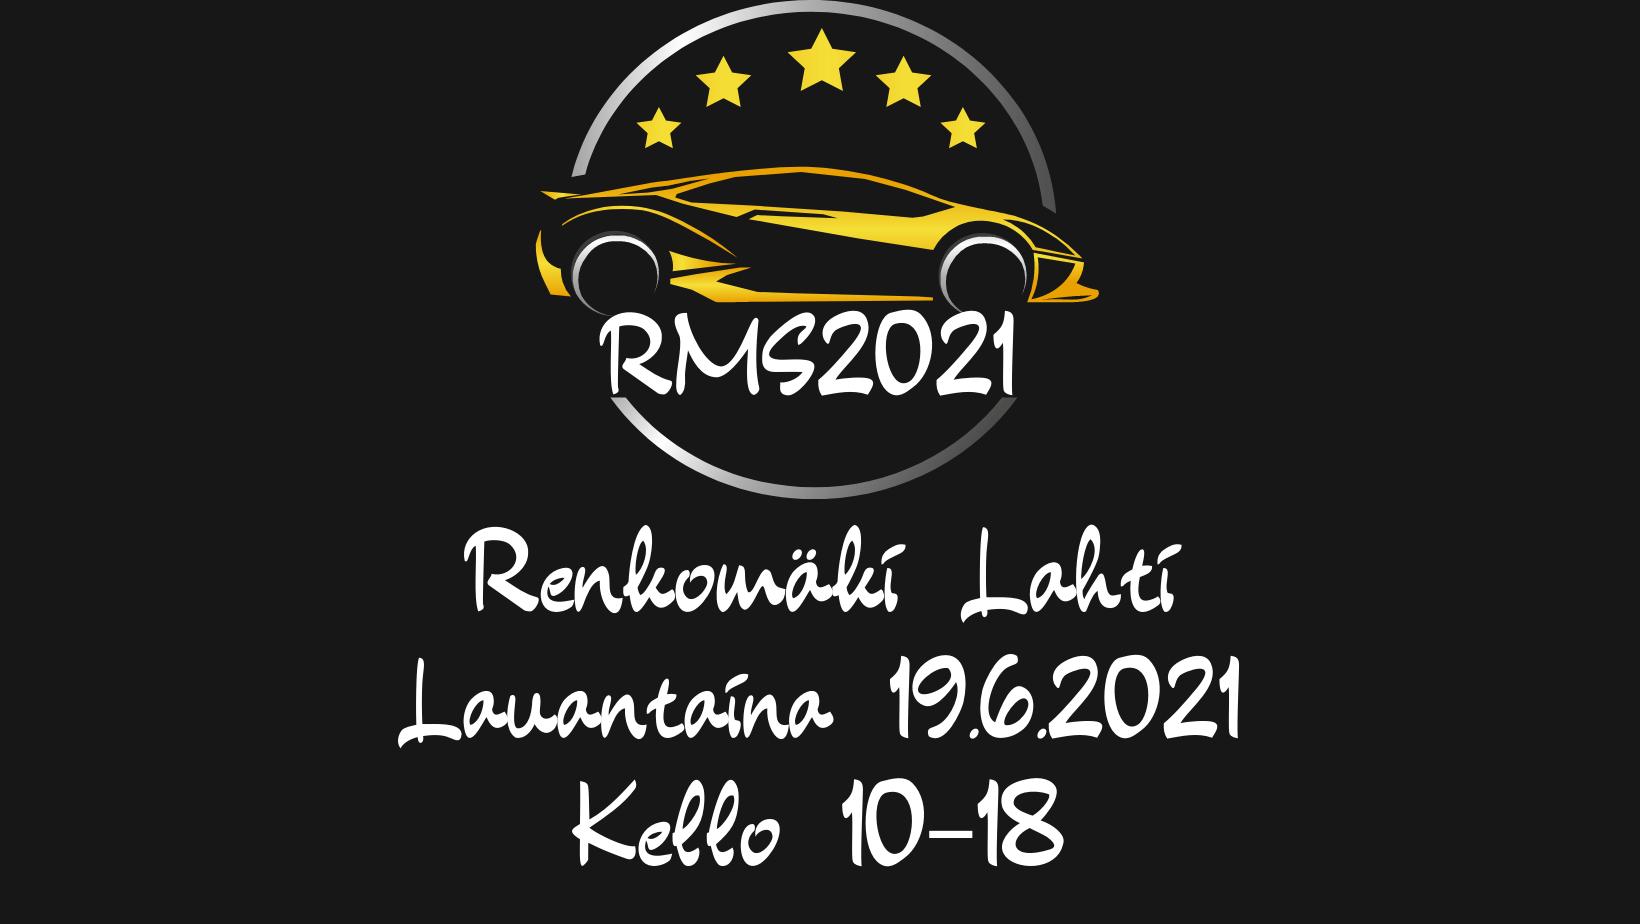 Renkomäki Motorshow 19.6.2021